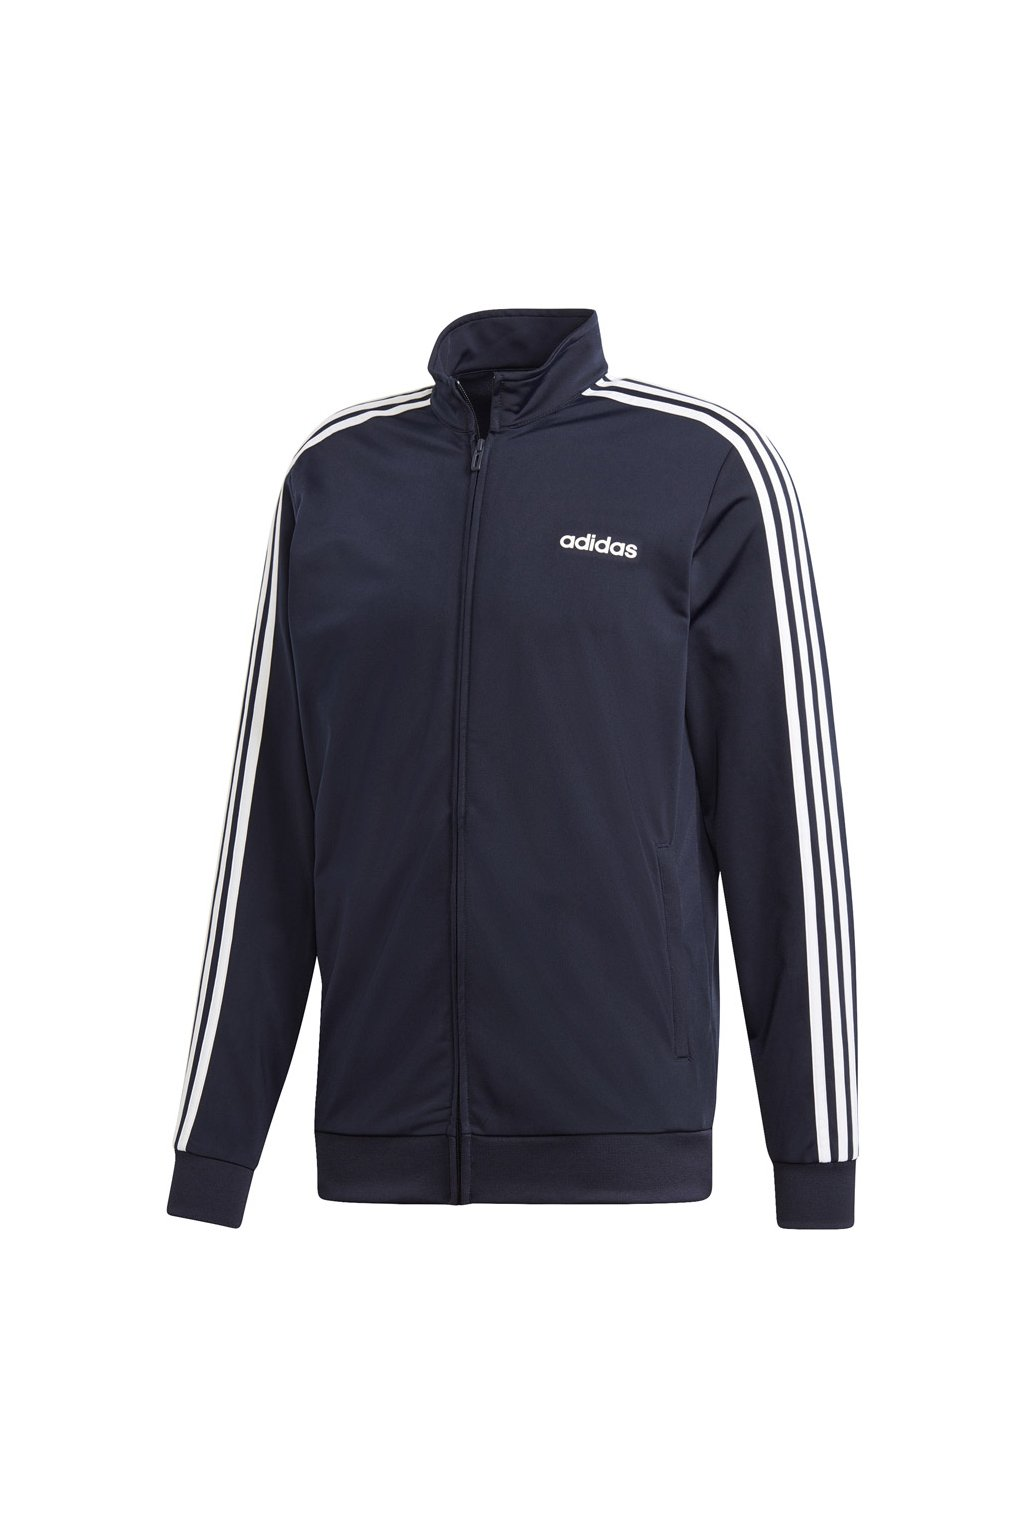 Pánska mikina Adidas Essentials 3 Stripes Tricot Track Top / tmavo modrá DU0445